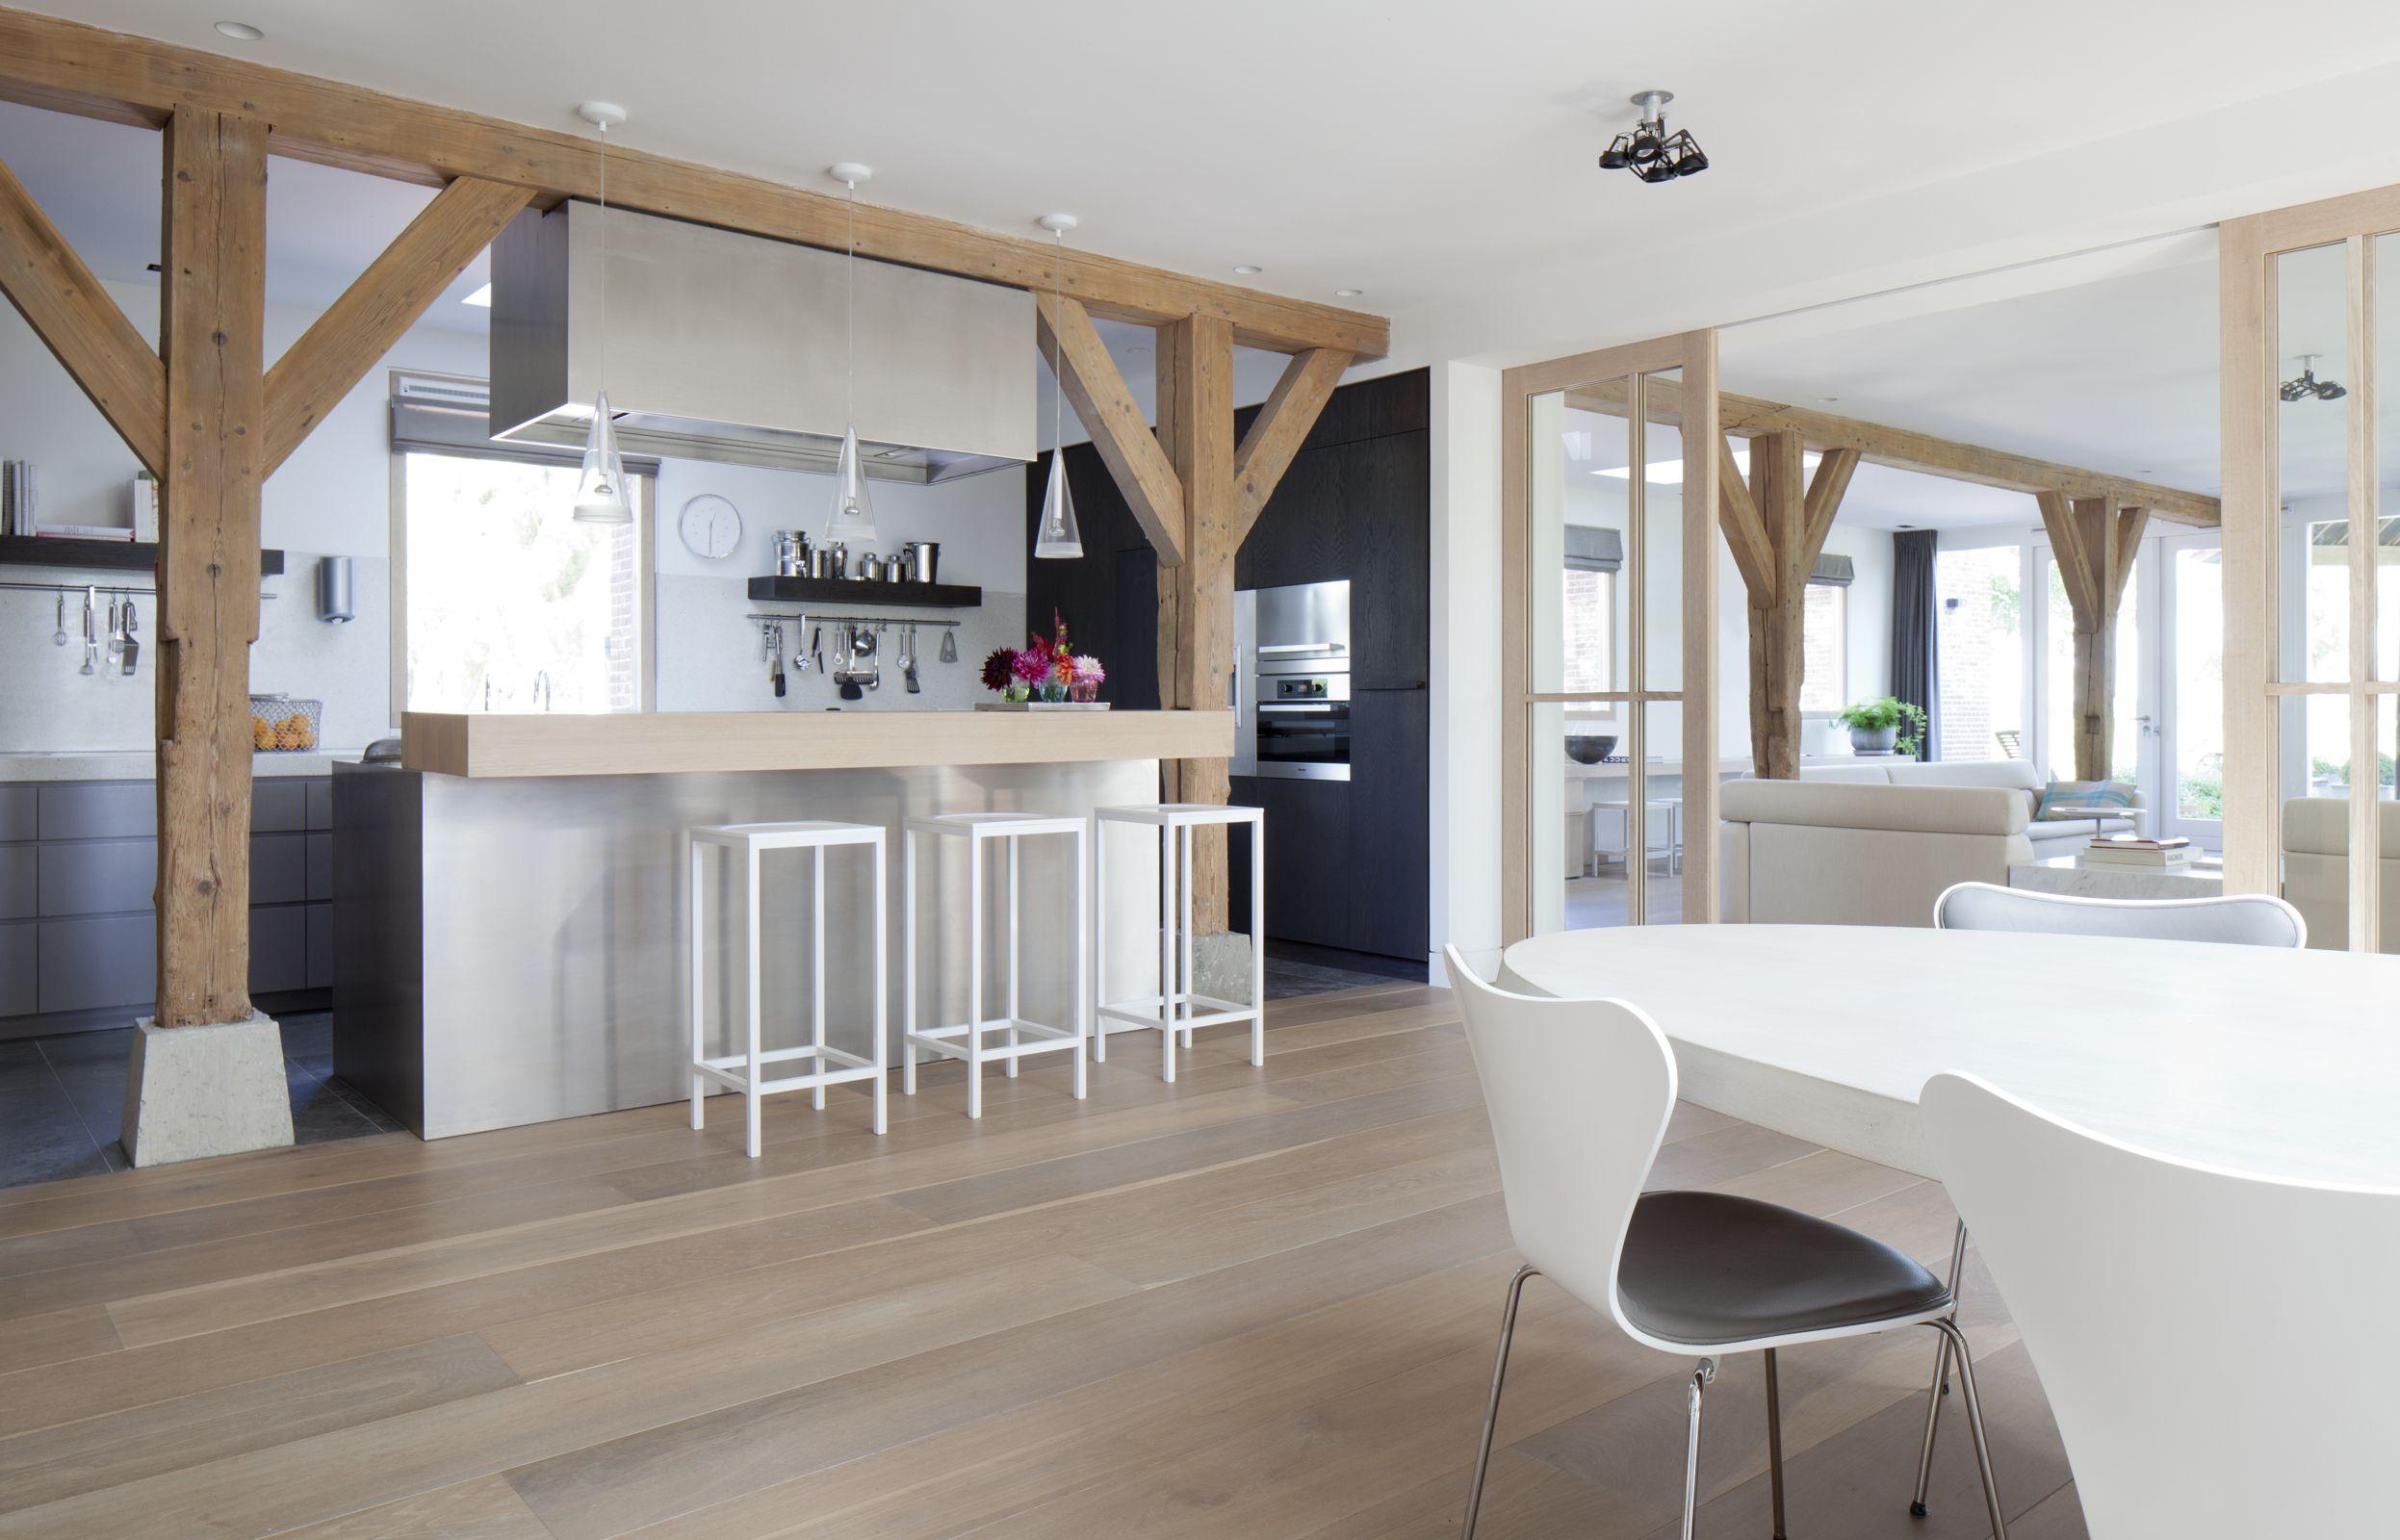 Keukenontwerp aan huis pin van griet wouters op huis in